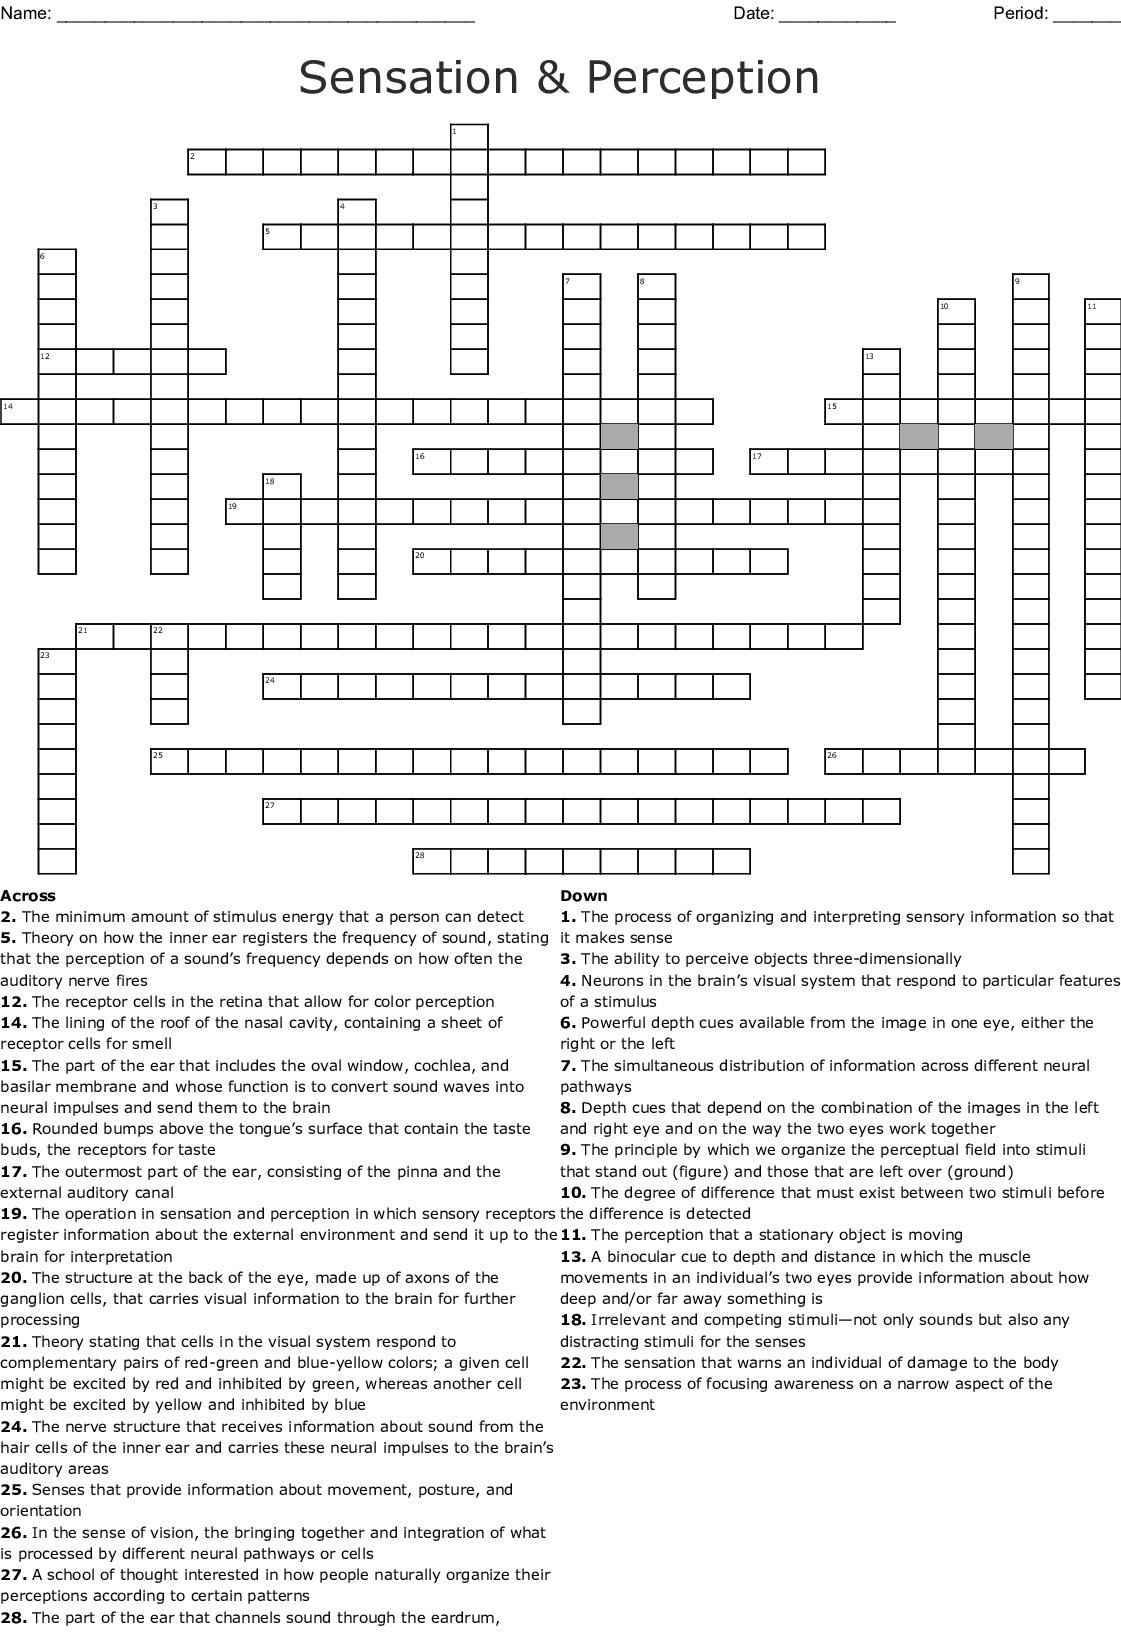 Sensation And Perception Crossword